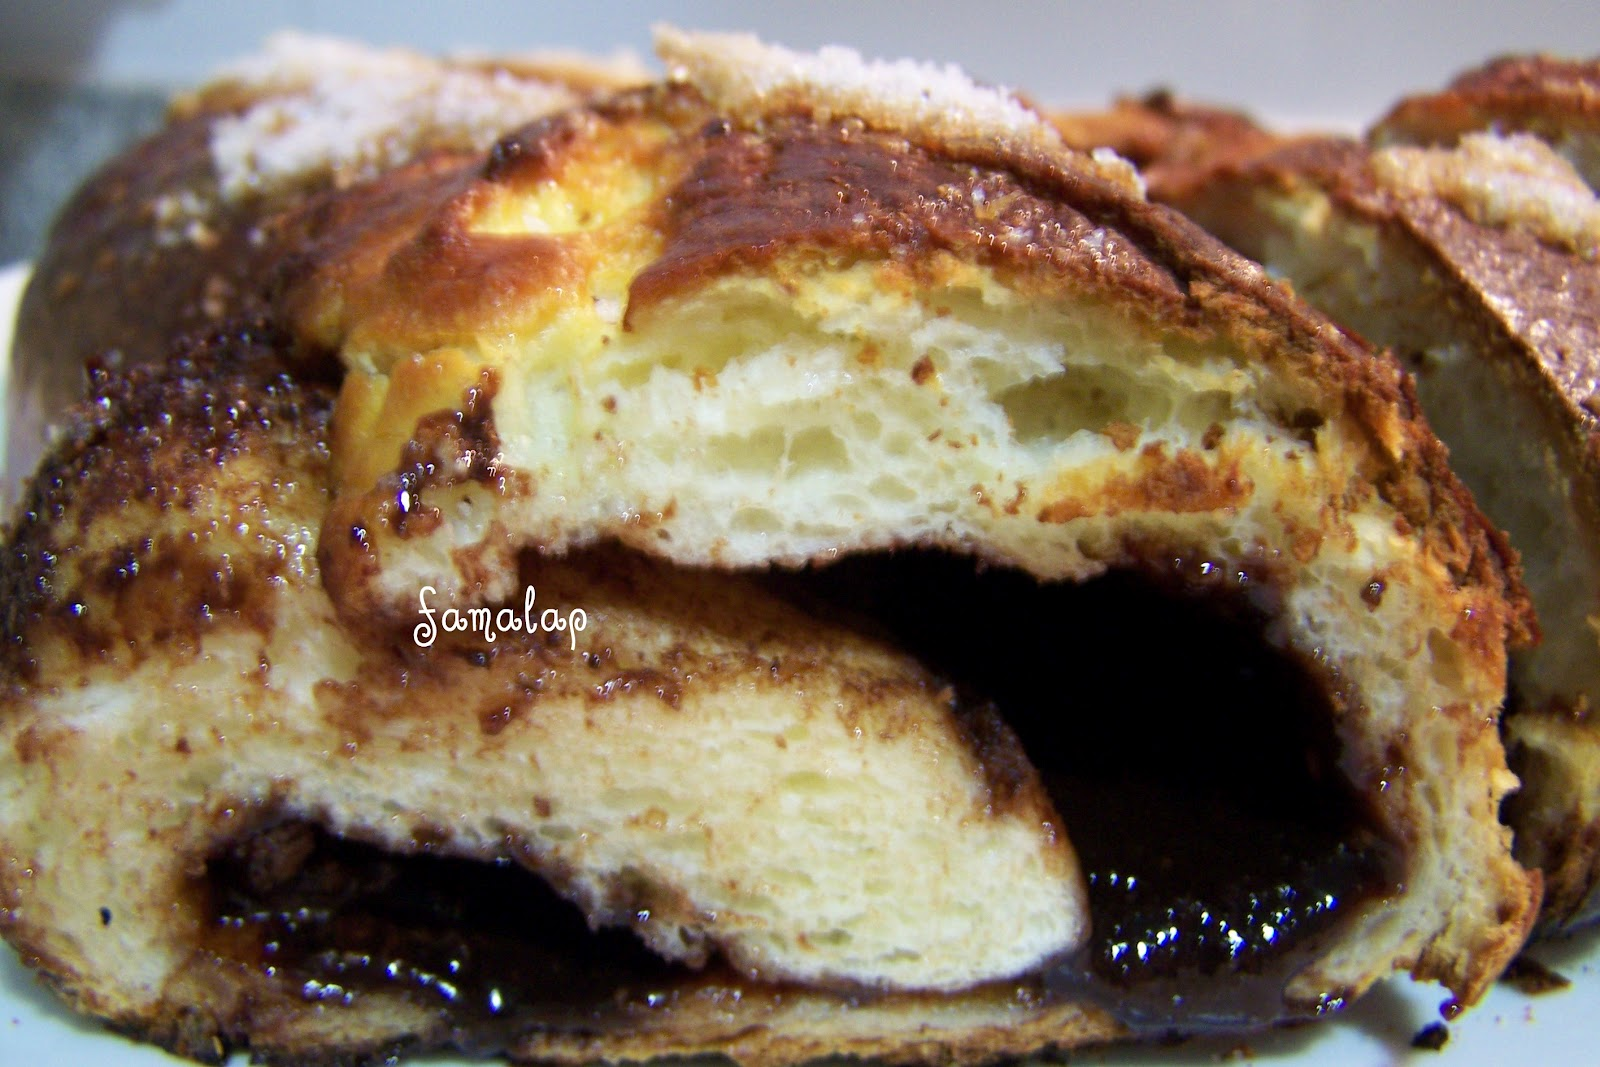 Cocina f cil sin gluten rotollo de nutella - Cocina facil sin gluten ...